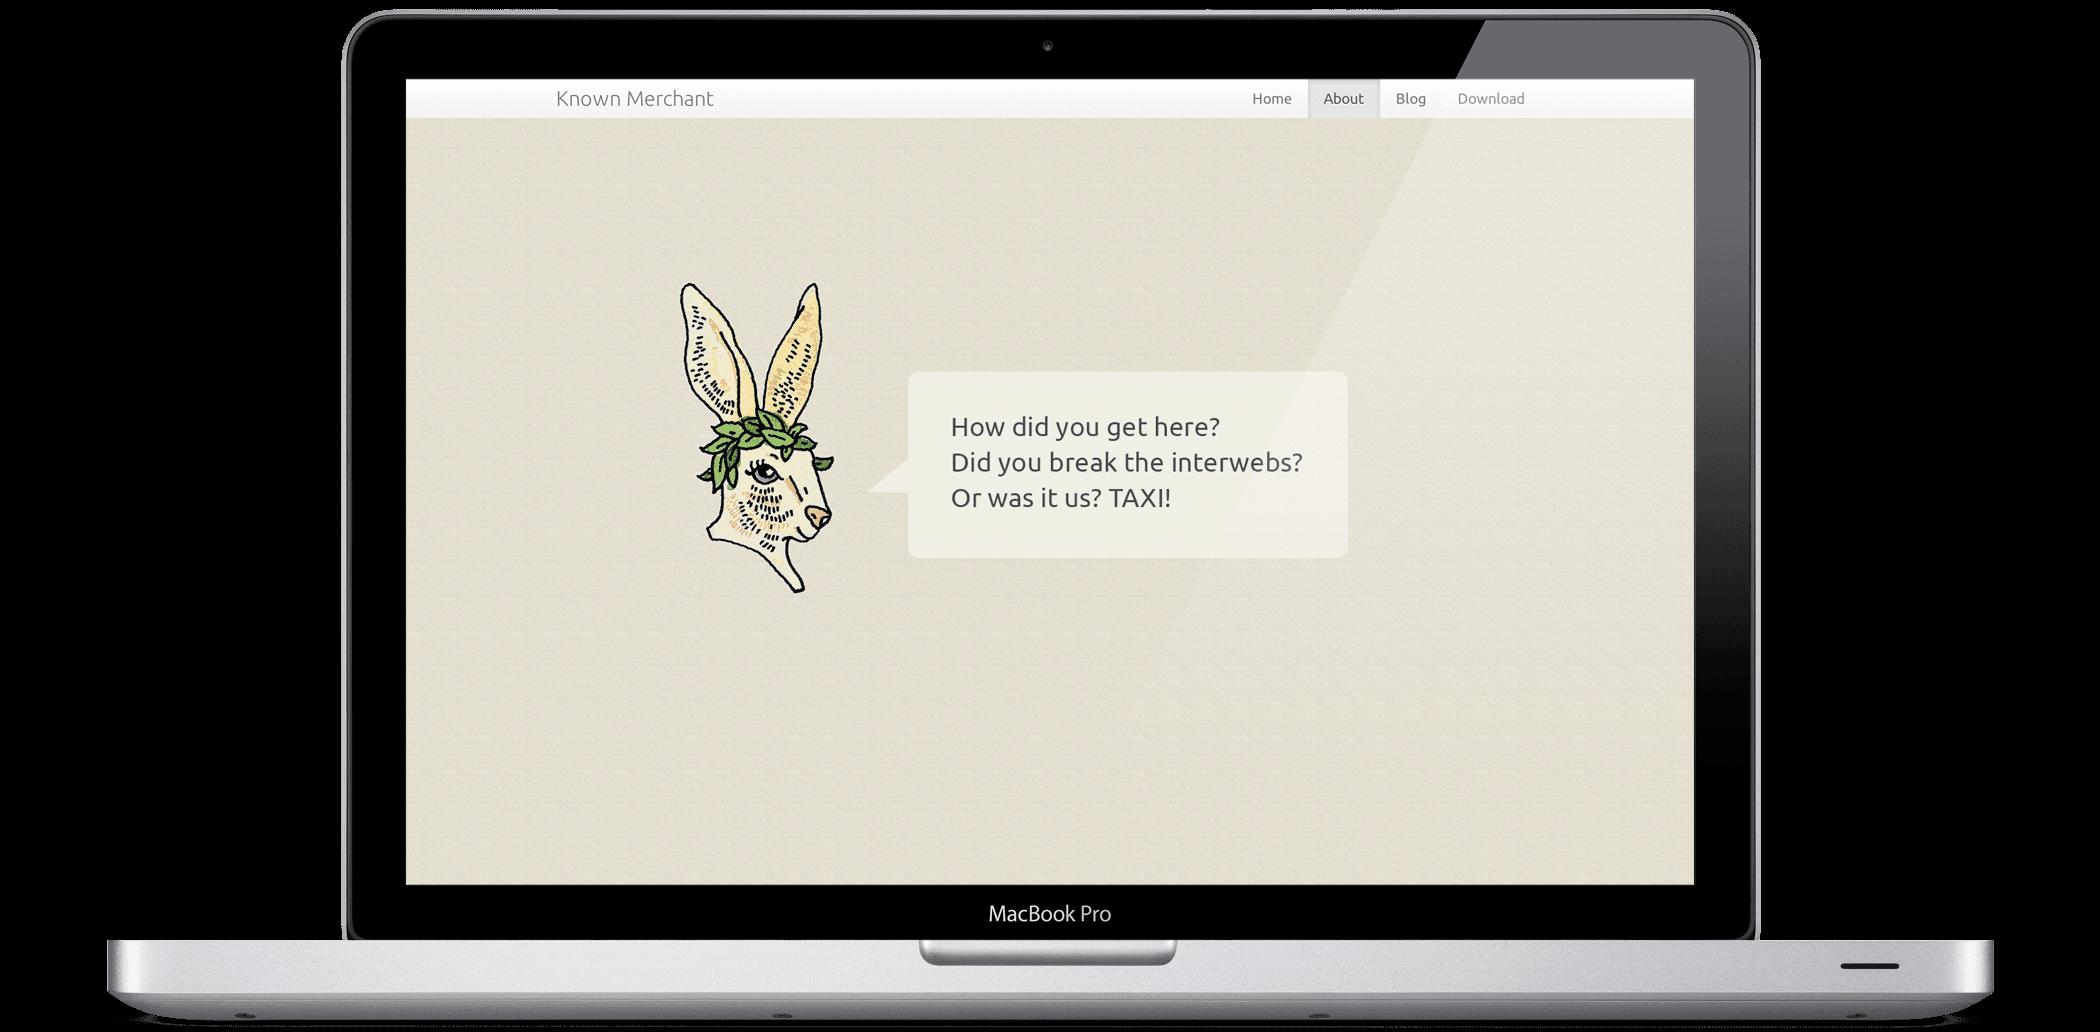 404 Error Message on Website